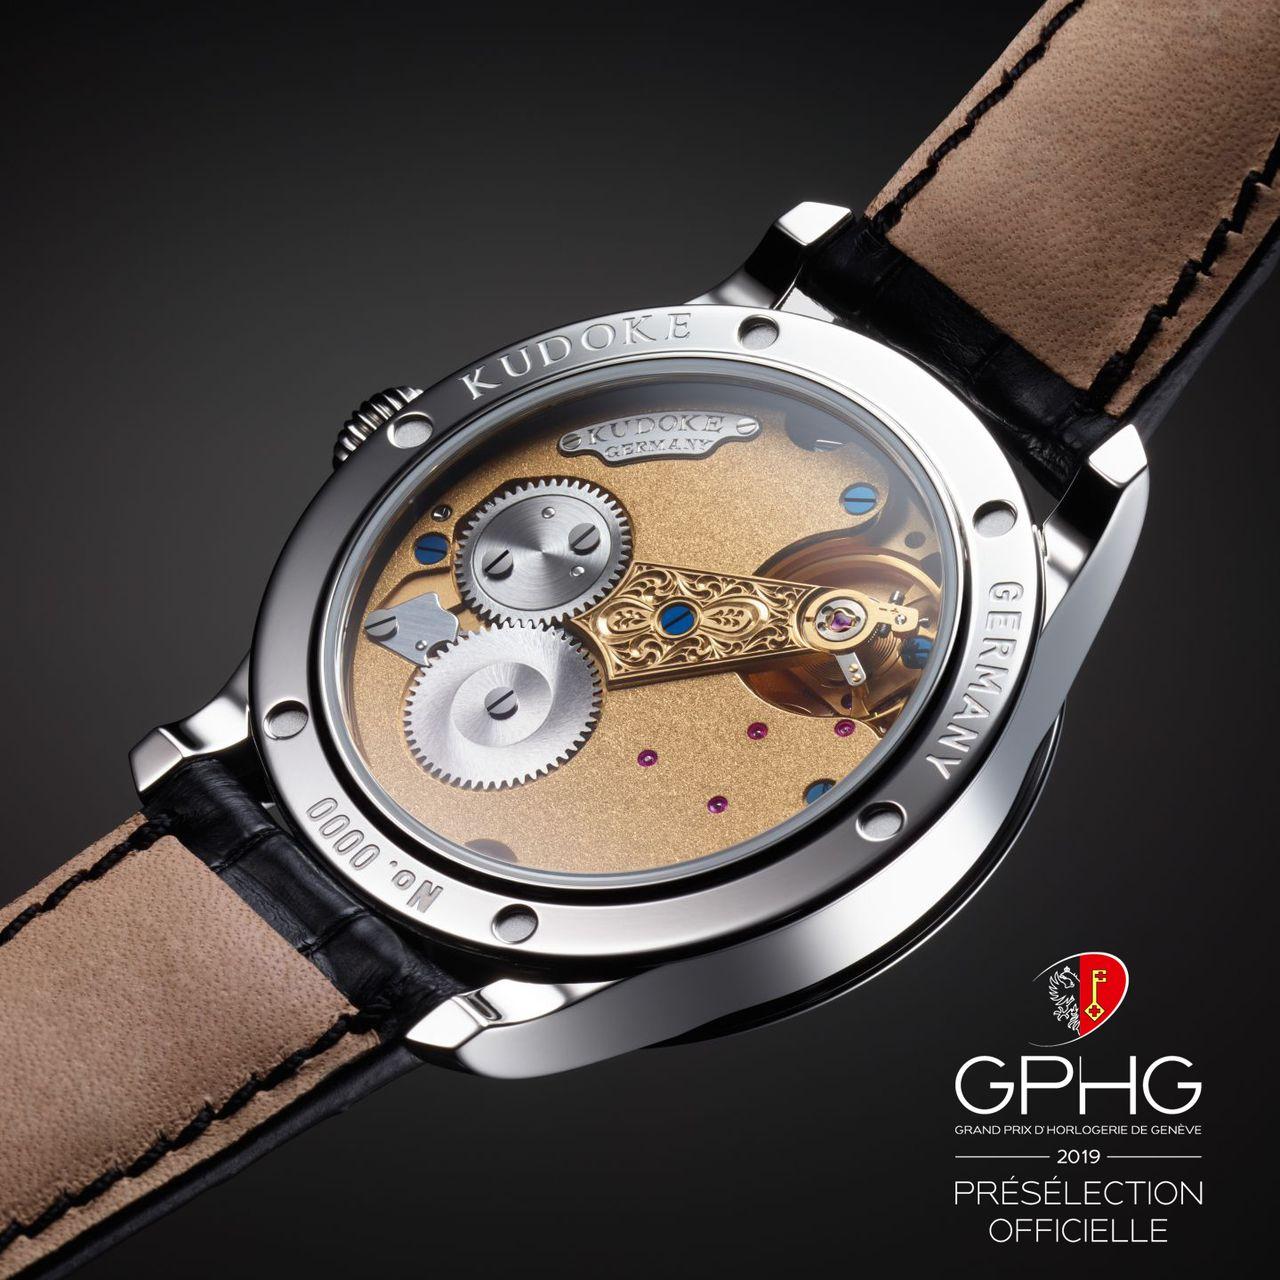 Kudoke - Grand Prix d'Horlogerie de Genéve